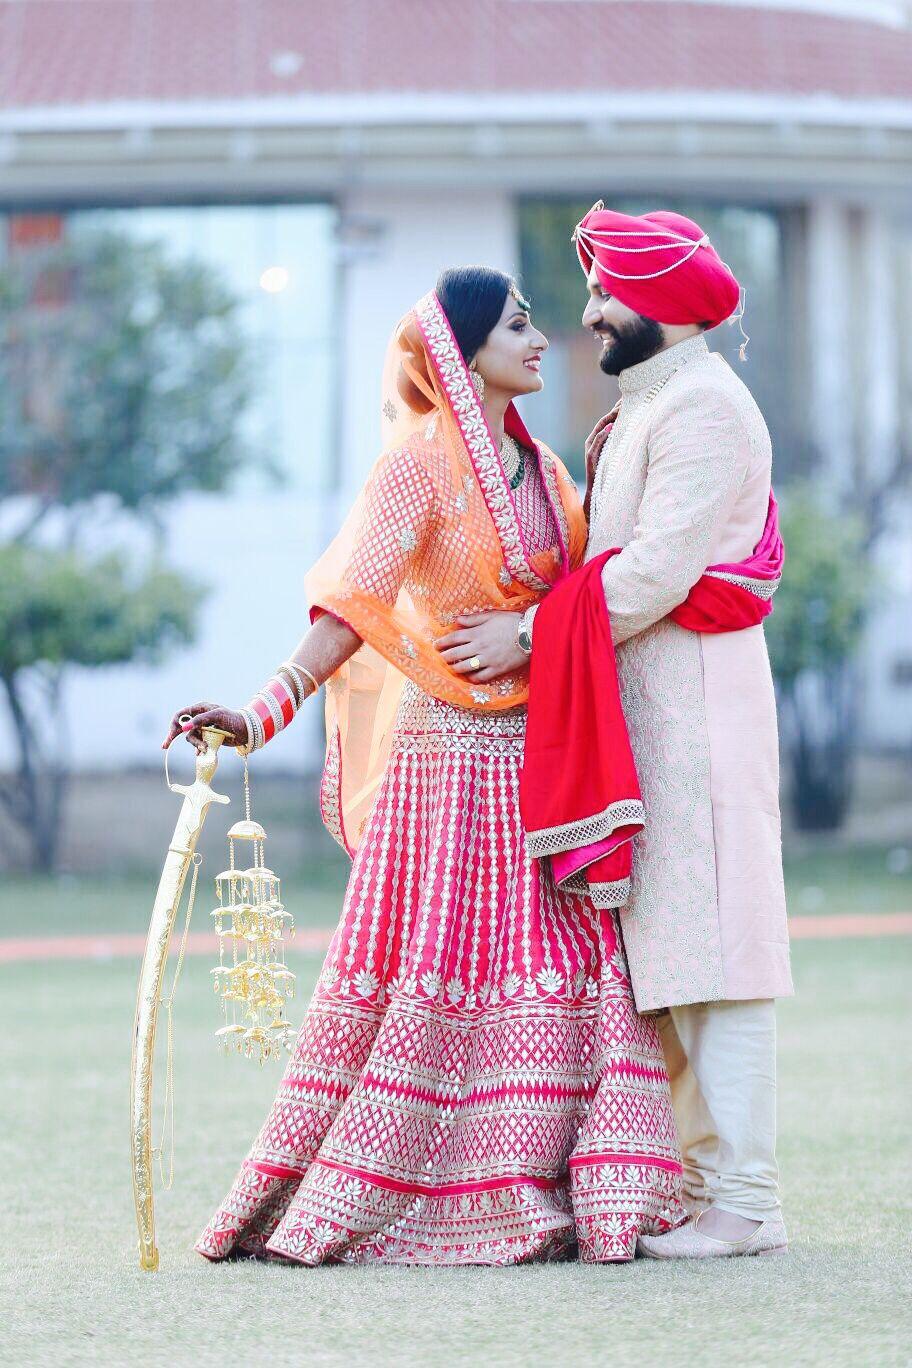 Punjabi wedding/Sikh wedding | This day I will marry my best friend ...